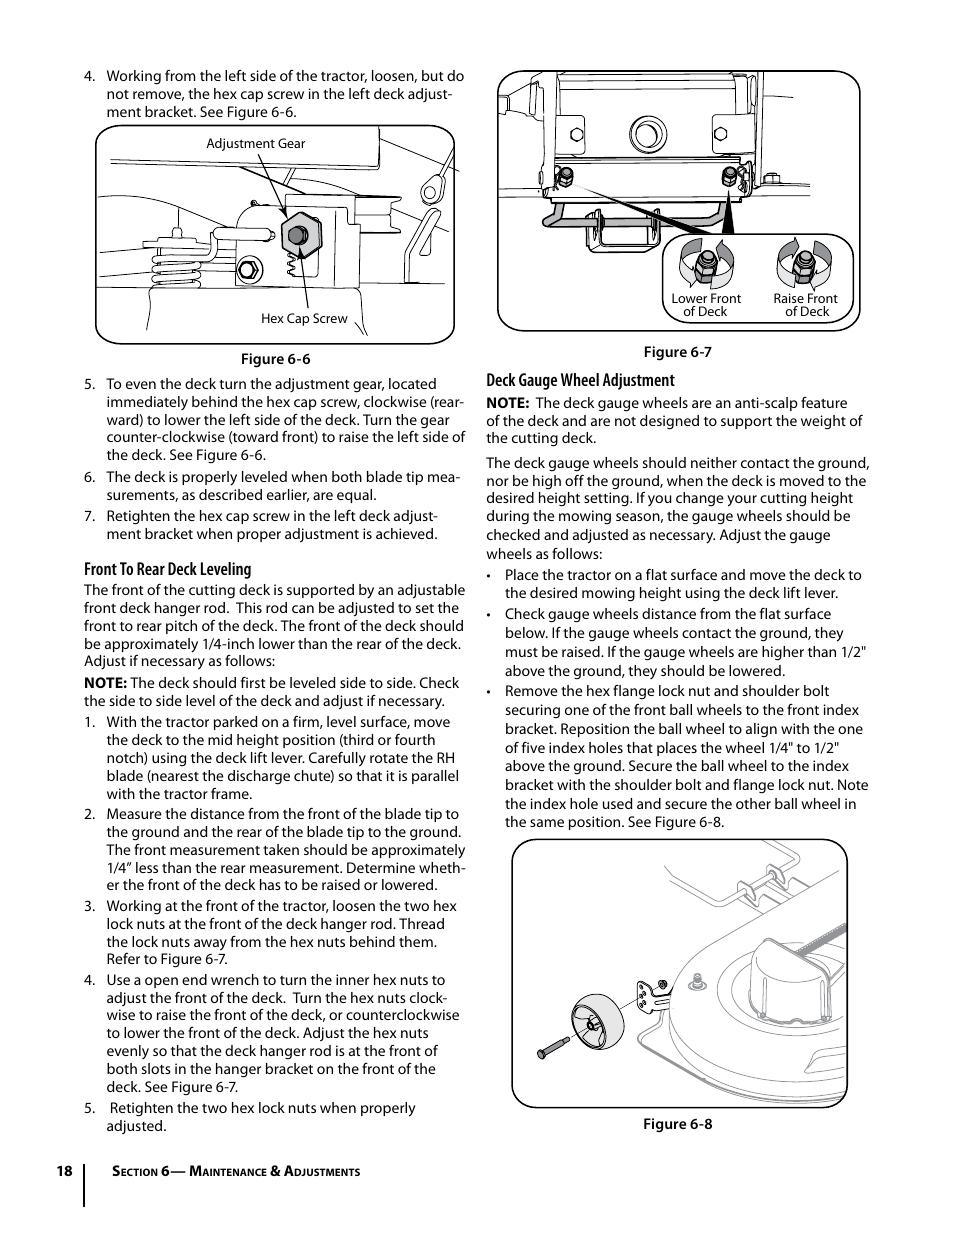 cub cadet i1042 user manual page 18 56 original mode rh manualsdir com cub cadet i1042 repair manual cub cadet 1042 manual